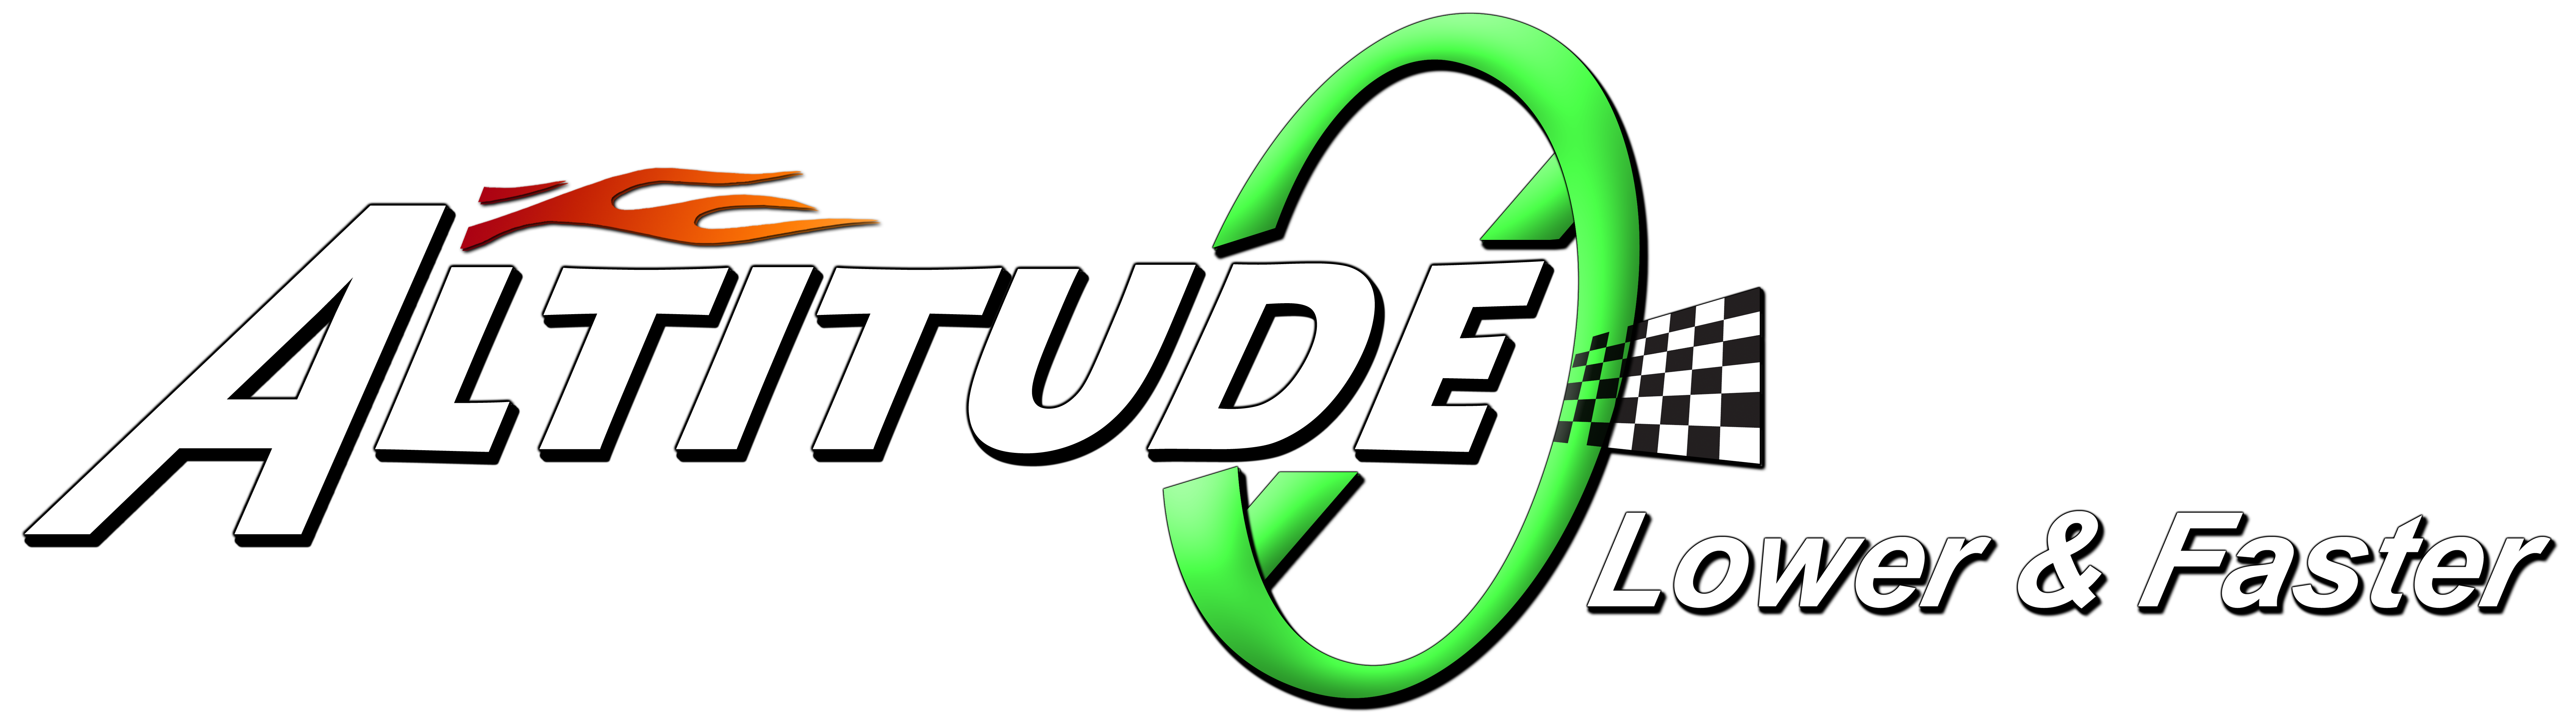 Altitude0 logo